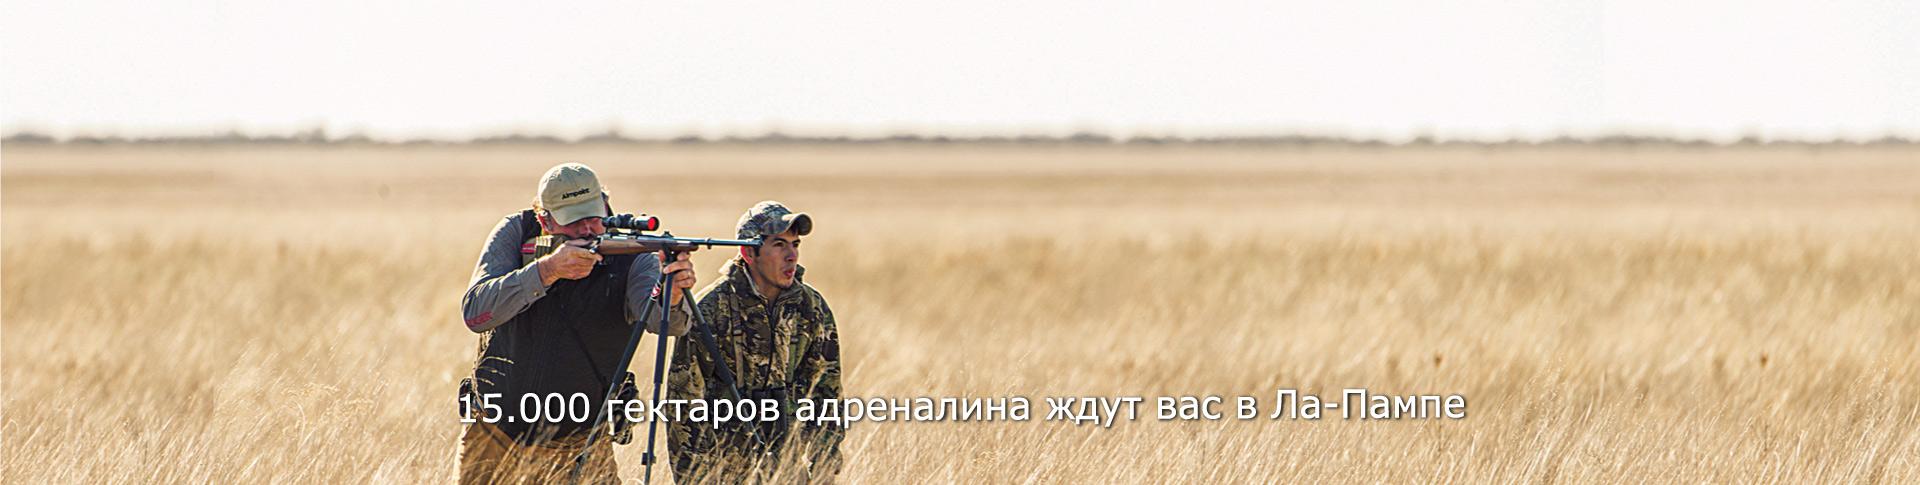 RUS01-2